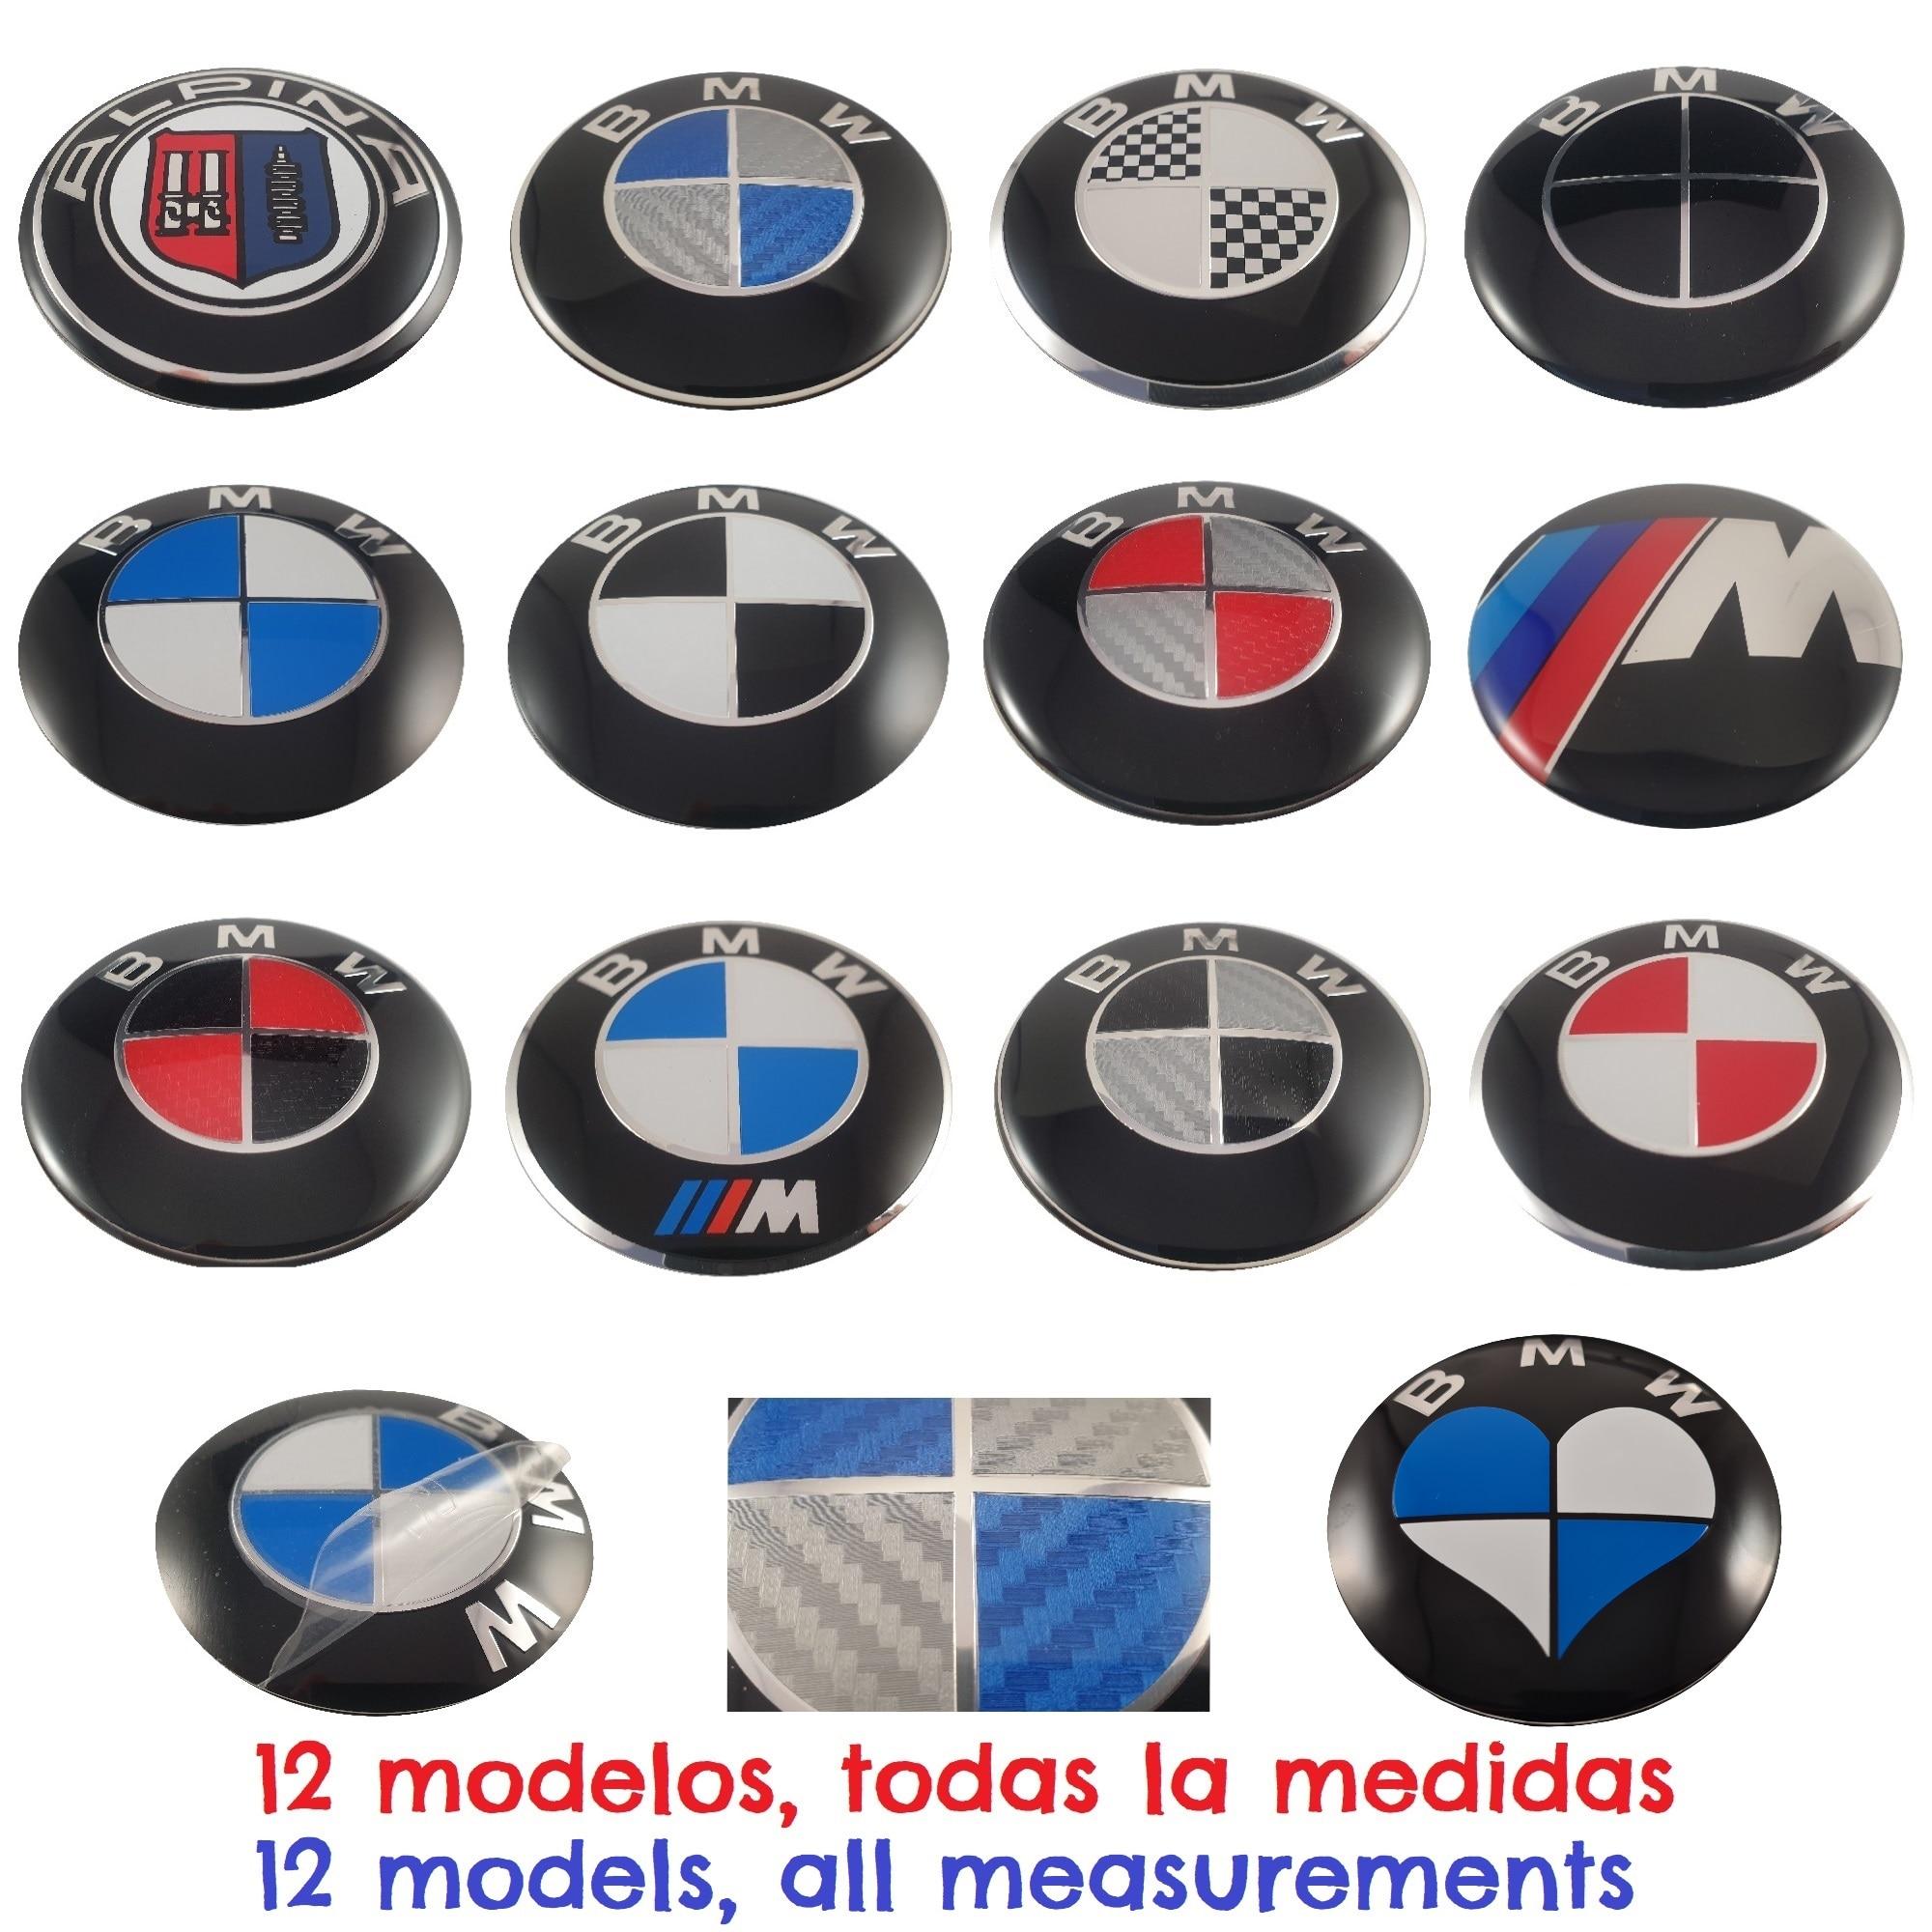 Logo BMW compatibile 82 millimetri 78 millimetri 74 millimetri 68 millimetri 45 millimetri 11 millimetri per auto Logo emblema automobile (Non originale BMW) aut016